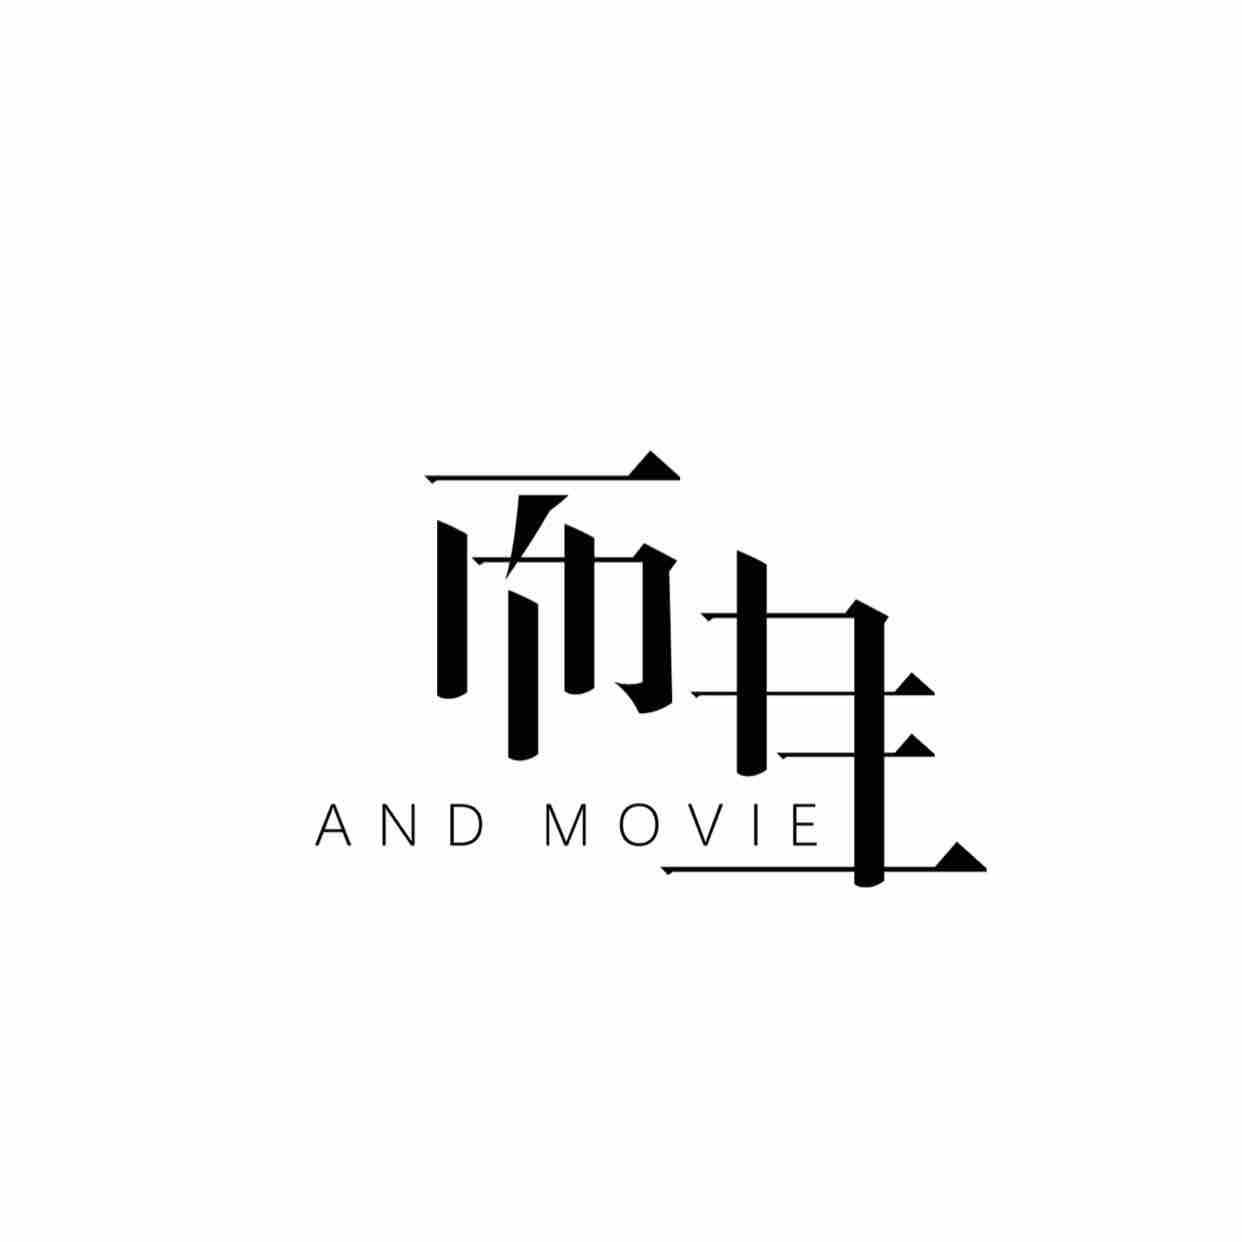 而且映画ANDMOVIE